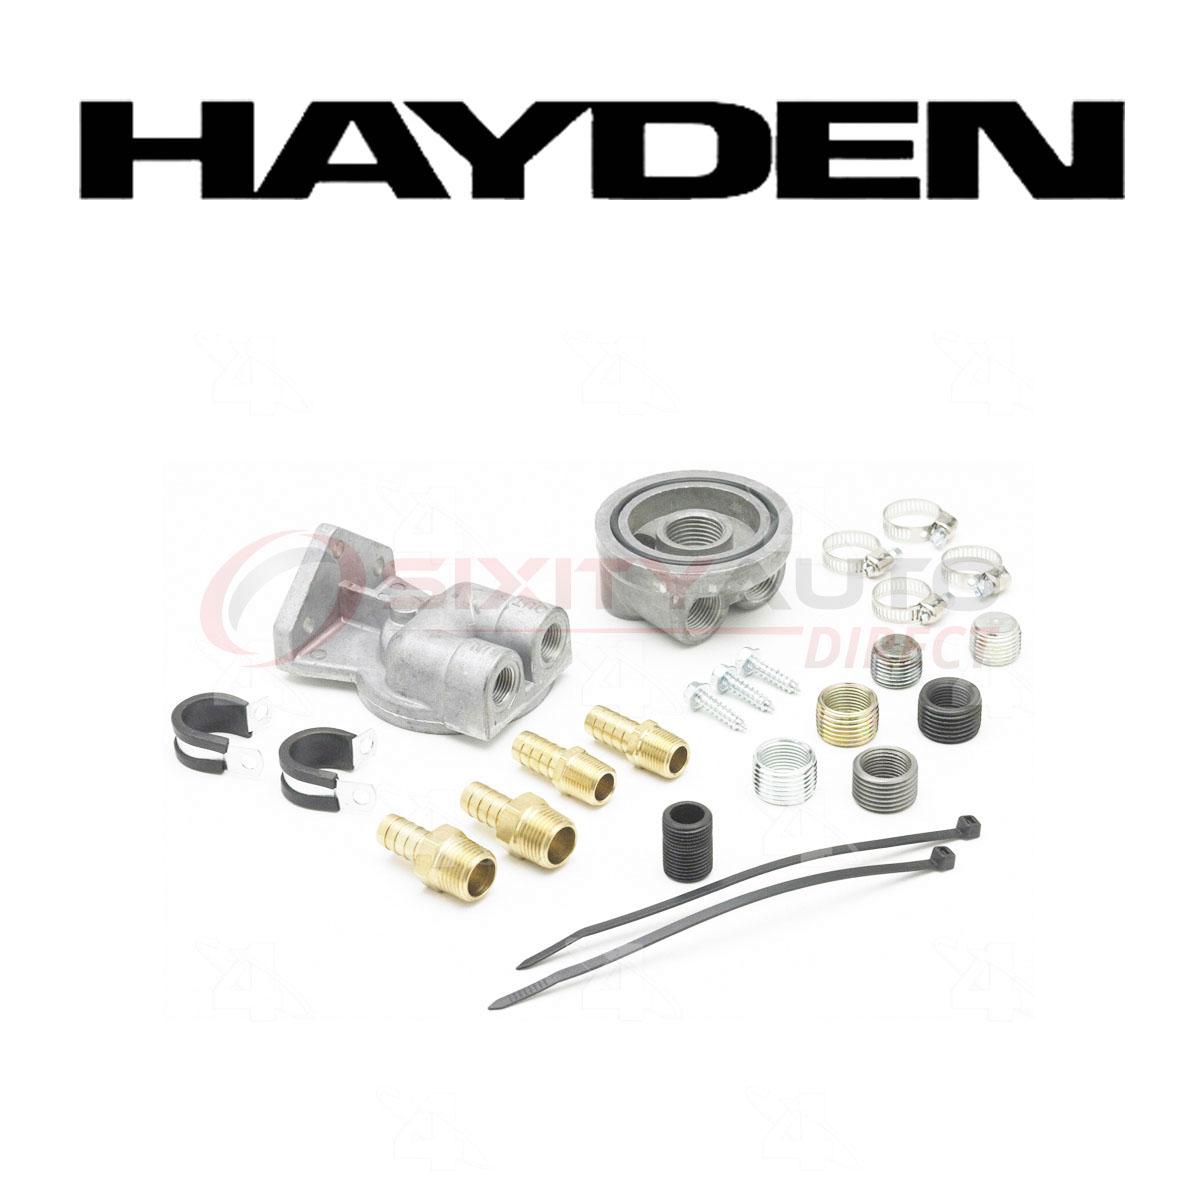 Hayden Oil Filter Remote Mounting Kit for 2000-2015